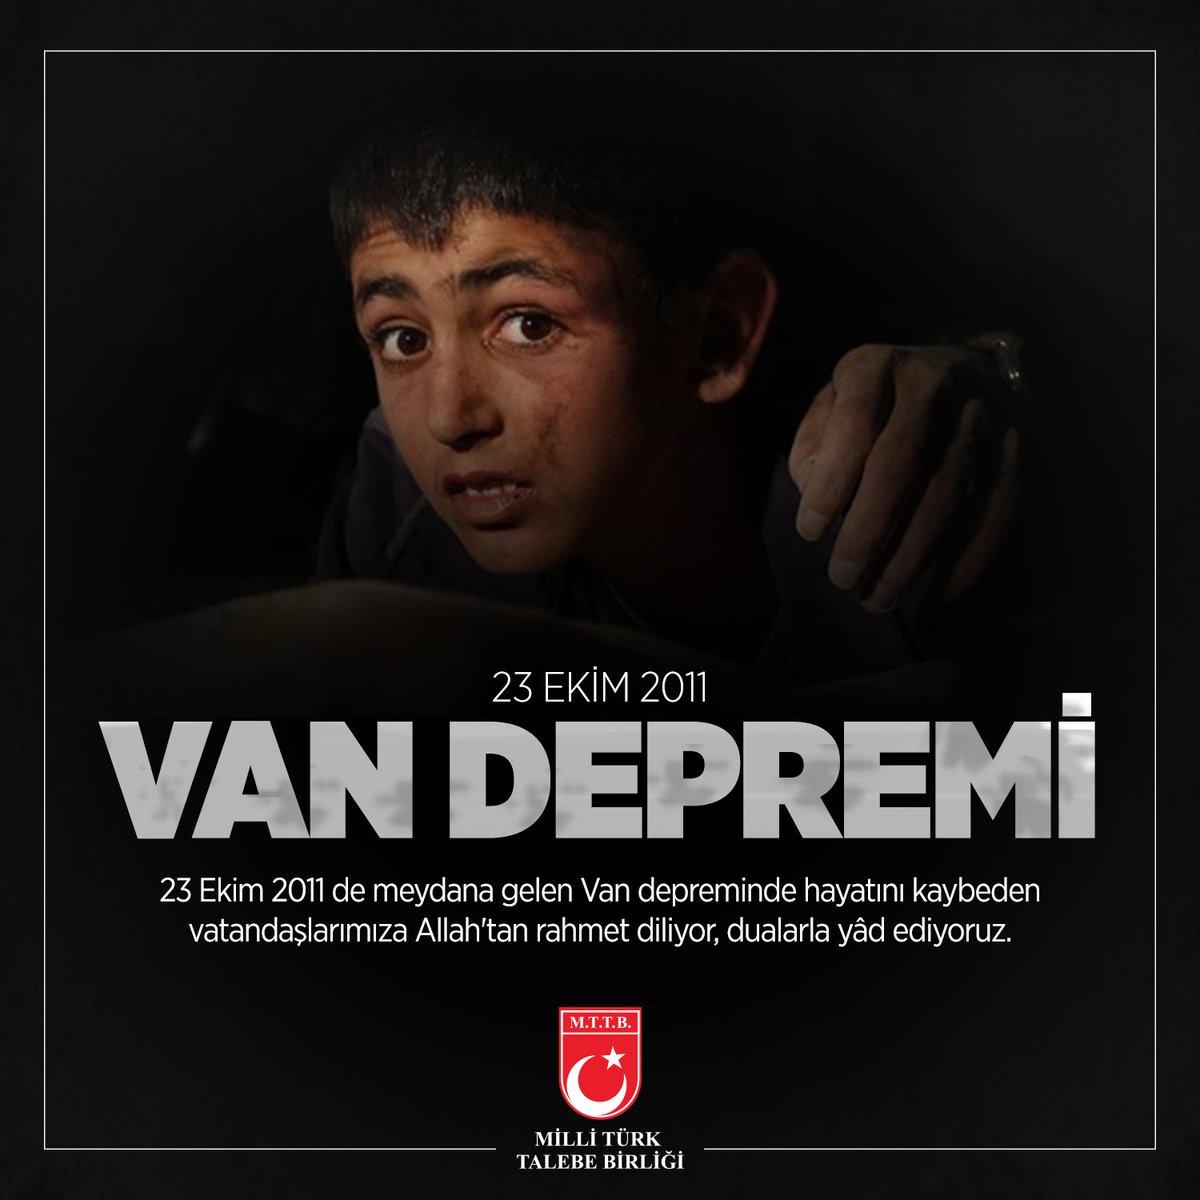 Van Depremi